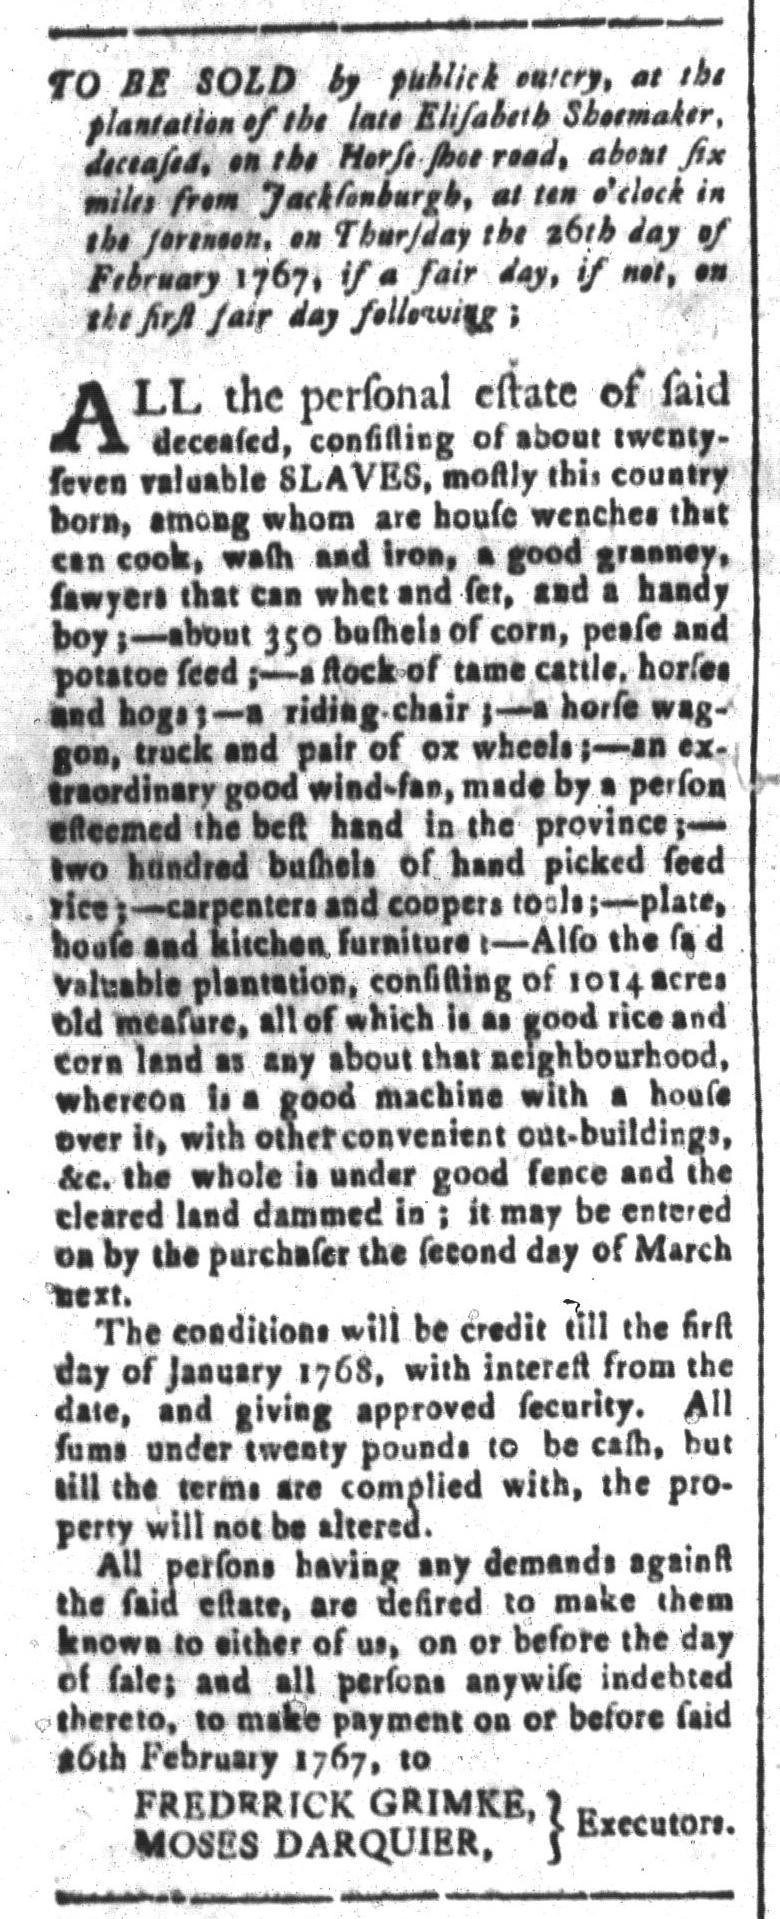 feb-6-south-carolina-and-american-general-gazette-slavery-3